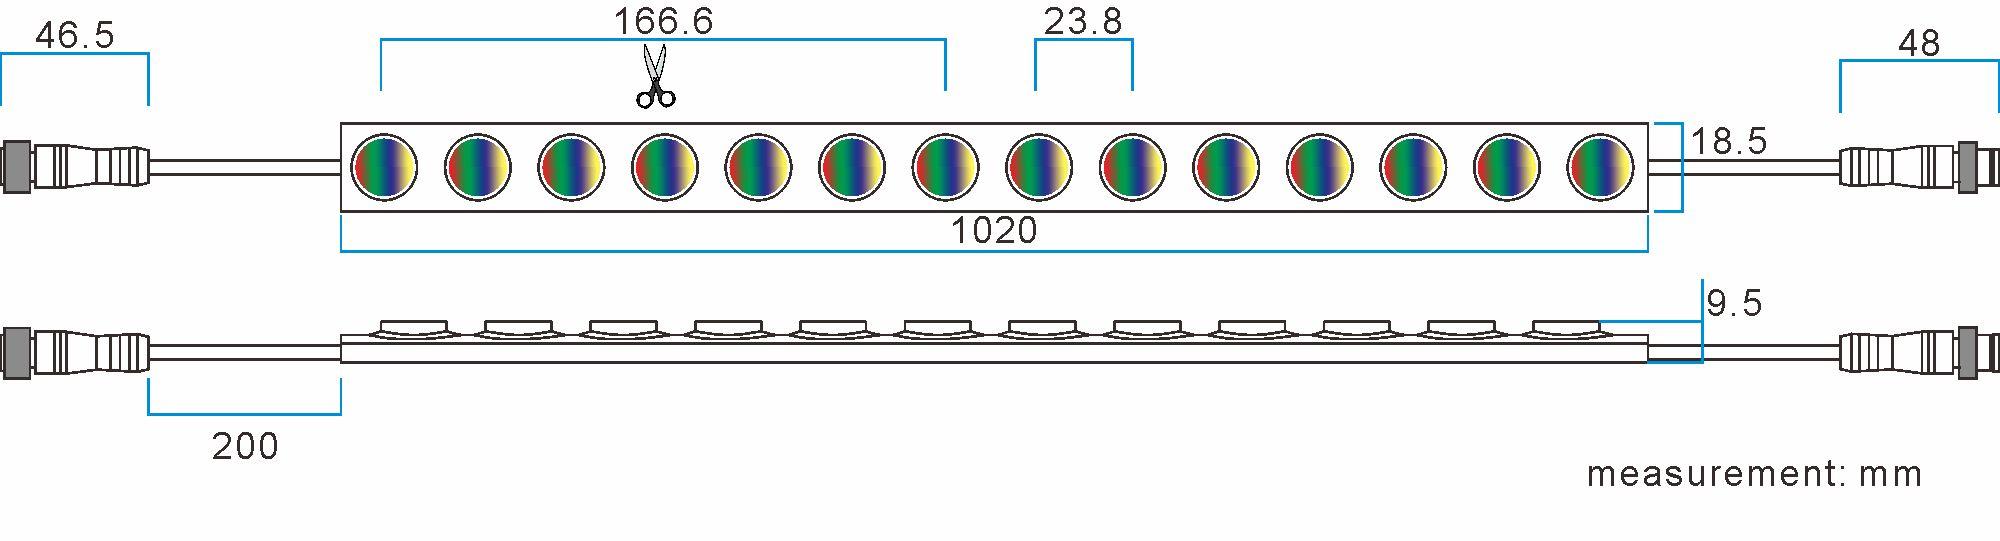 WLRGBW dimension drawing 5050 LEDRGBW flexible wall washer light TPU material IP67 waterproof LED strip